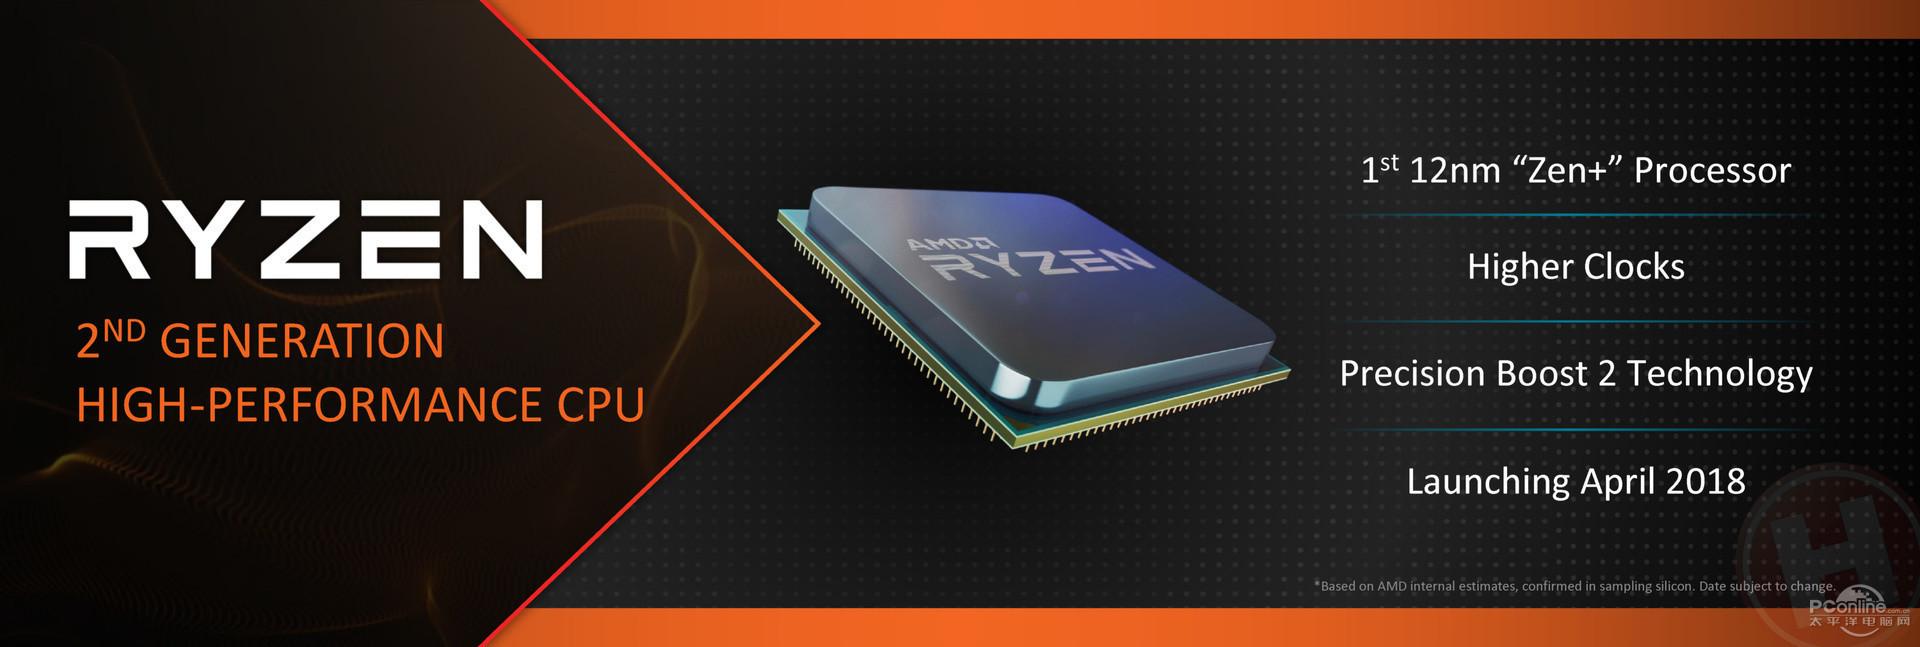 AMD二代锐龙处理器性能提升10%,缩小与Intel的差距